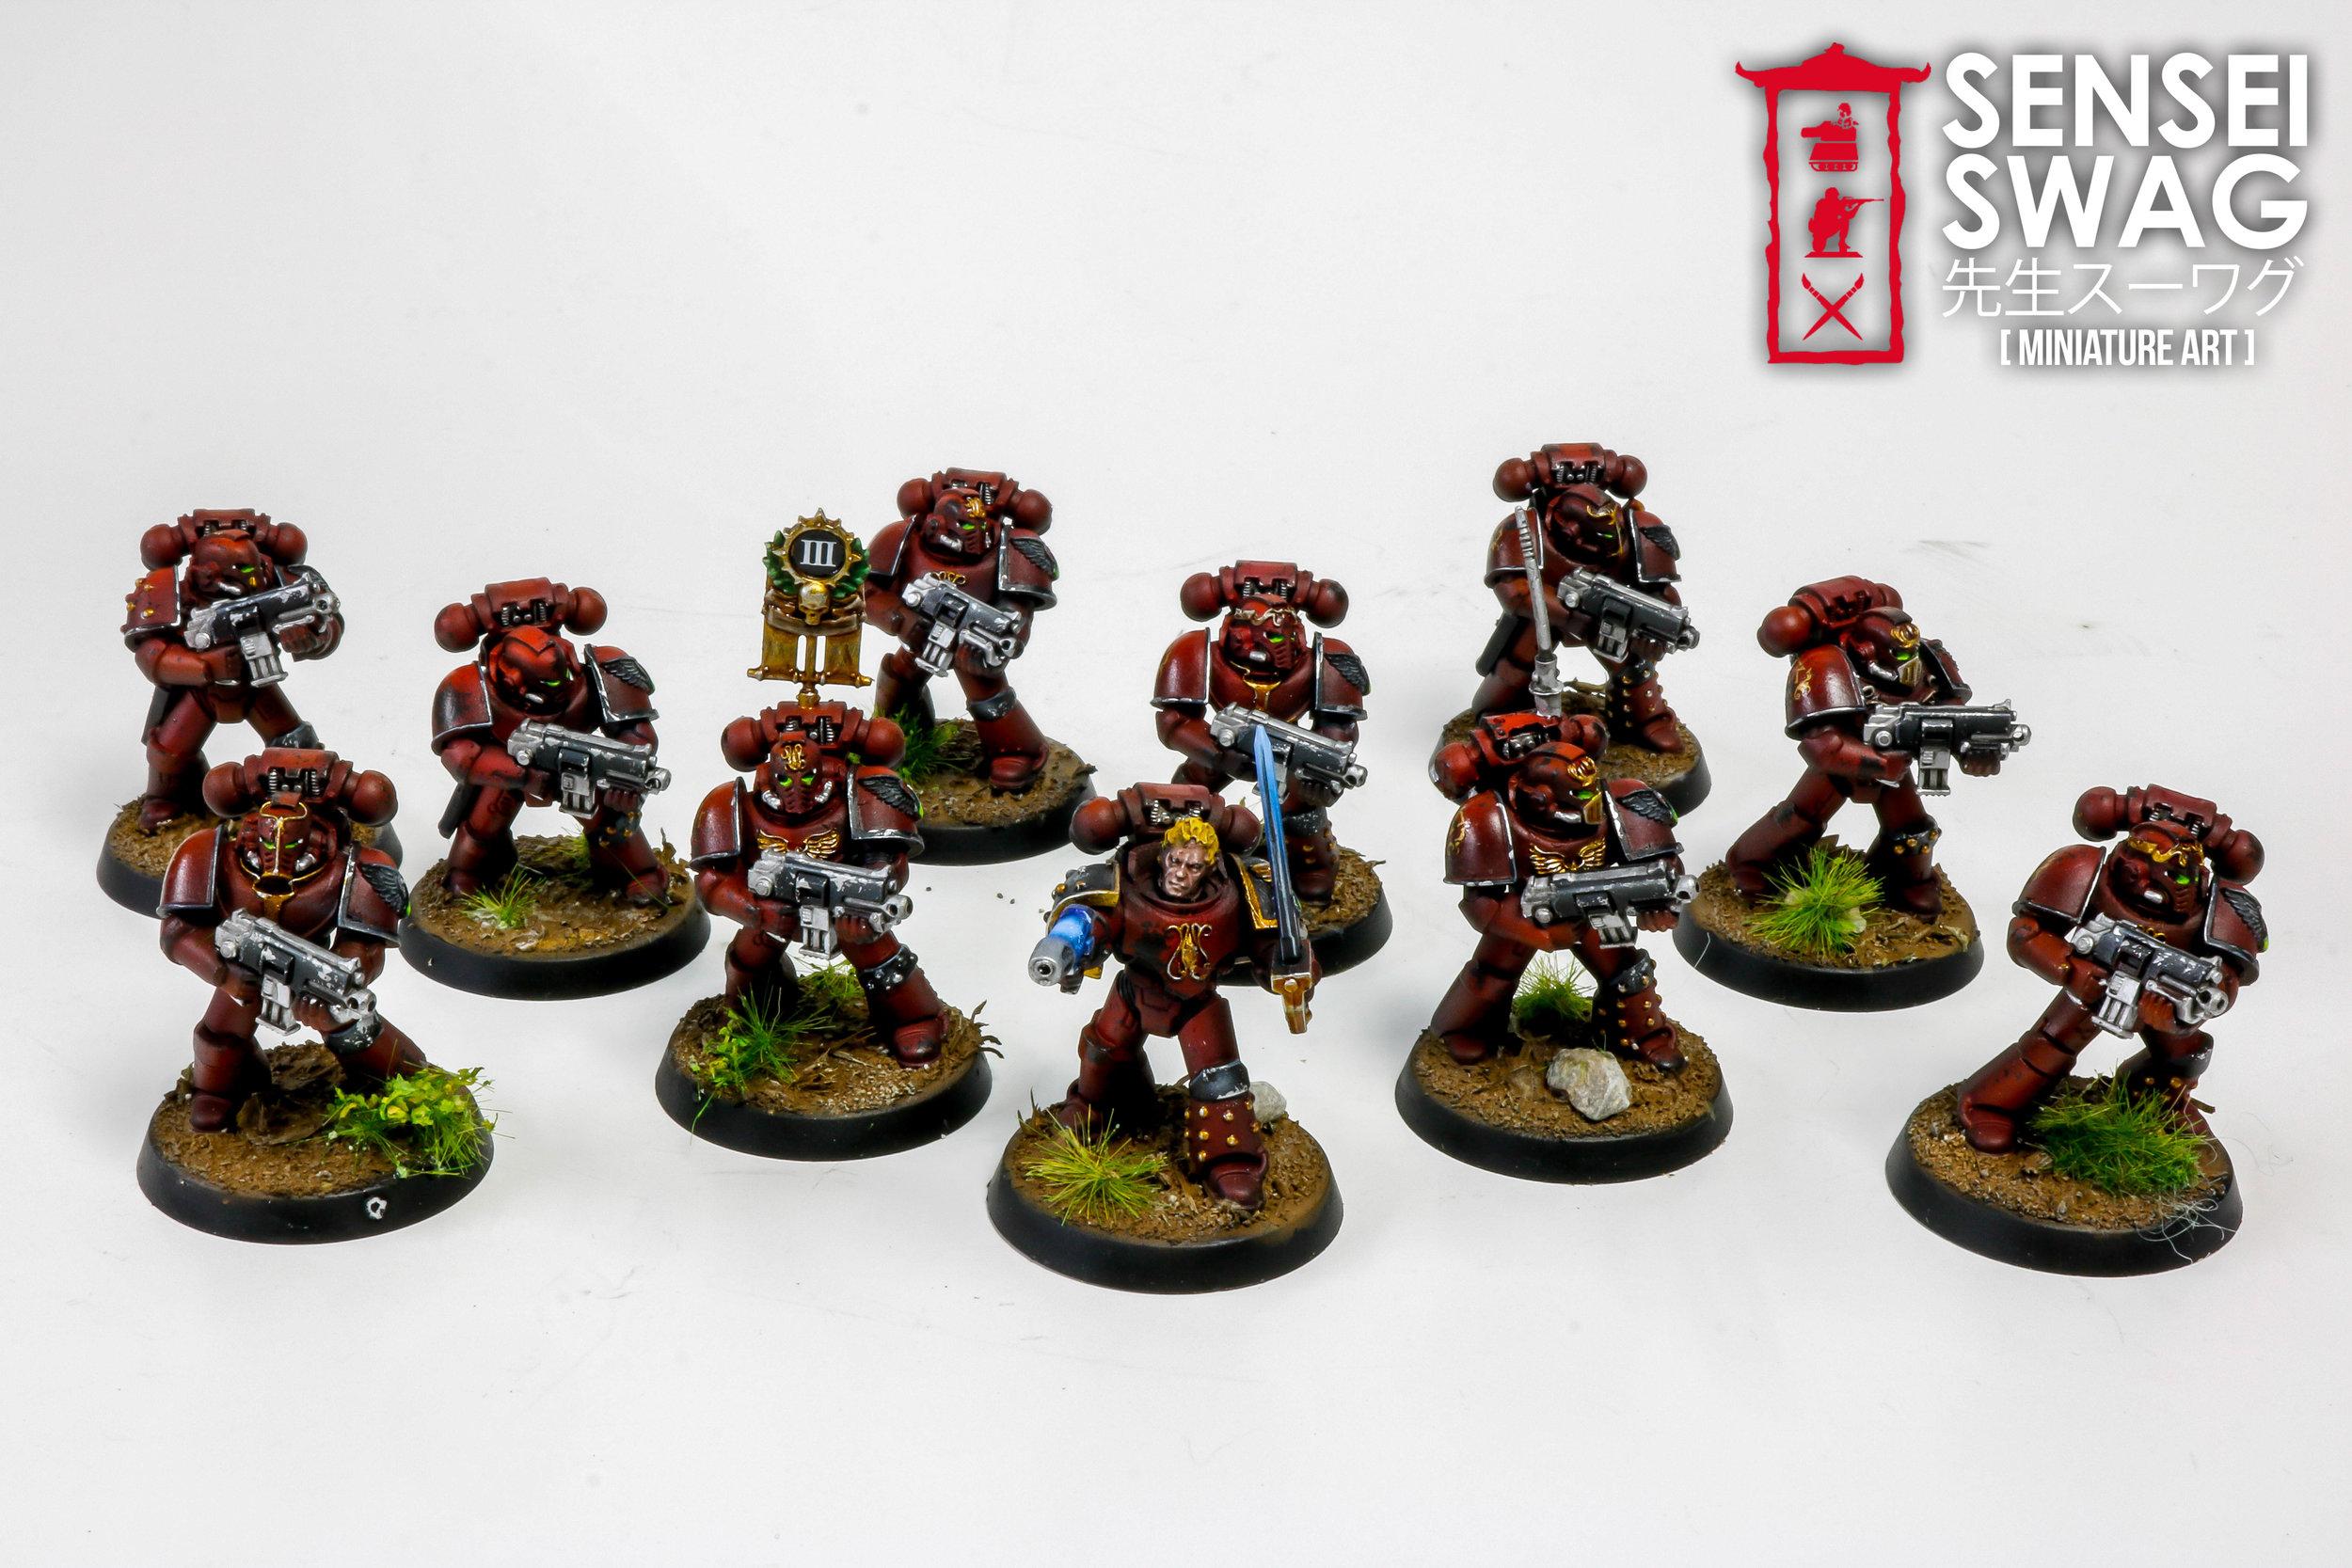 Blood Angels Horus Heresy Spartan Fire Raptor Legionnaires-5.jpg